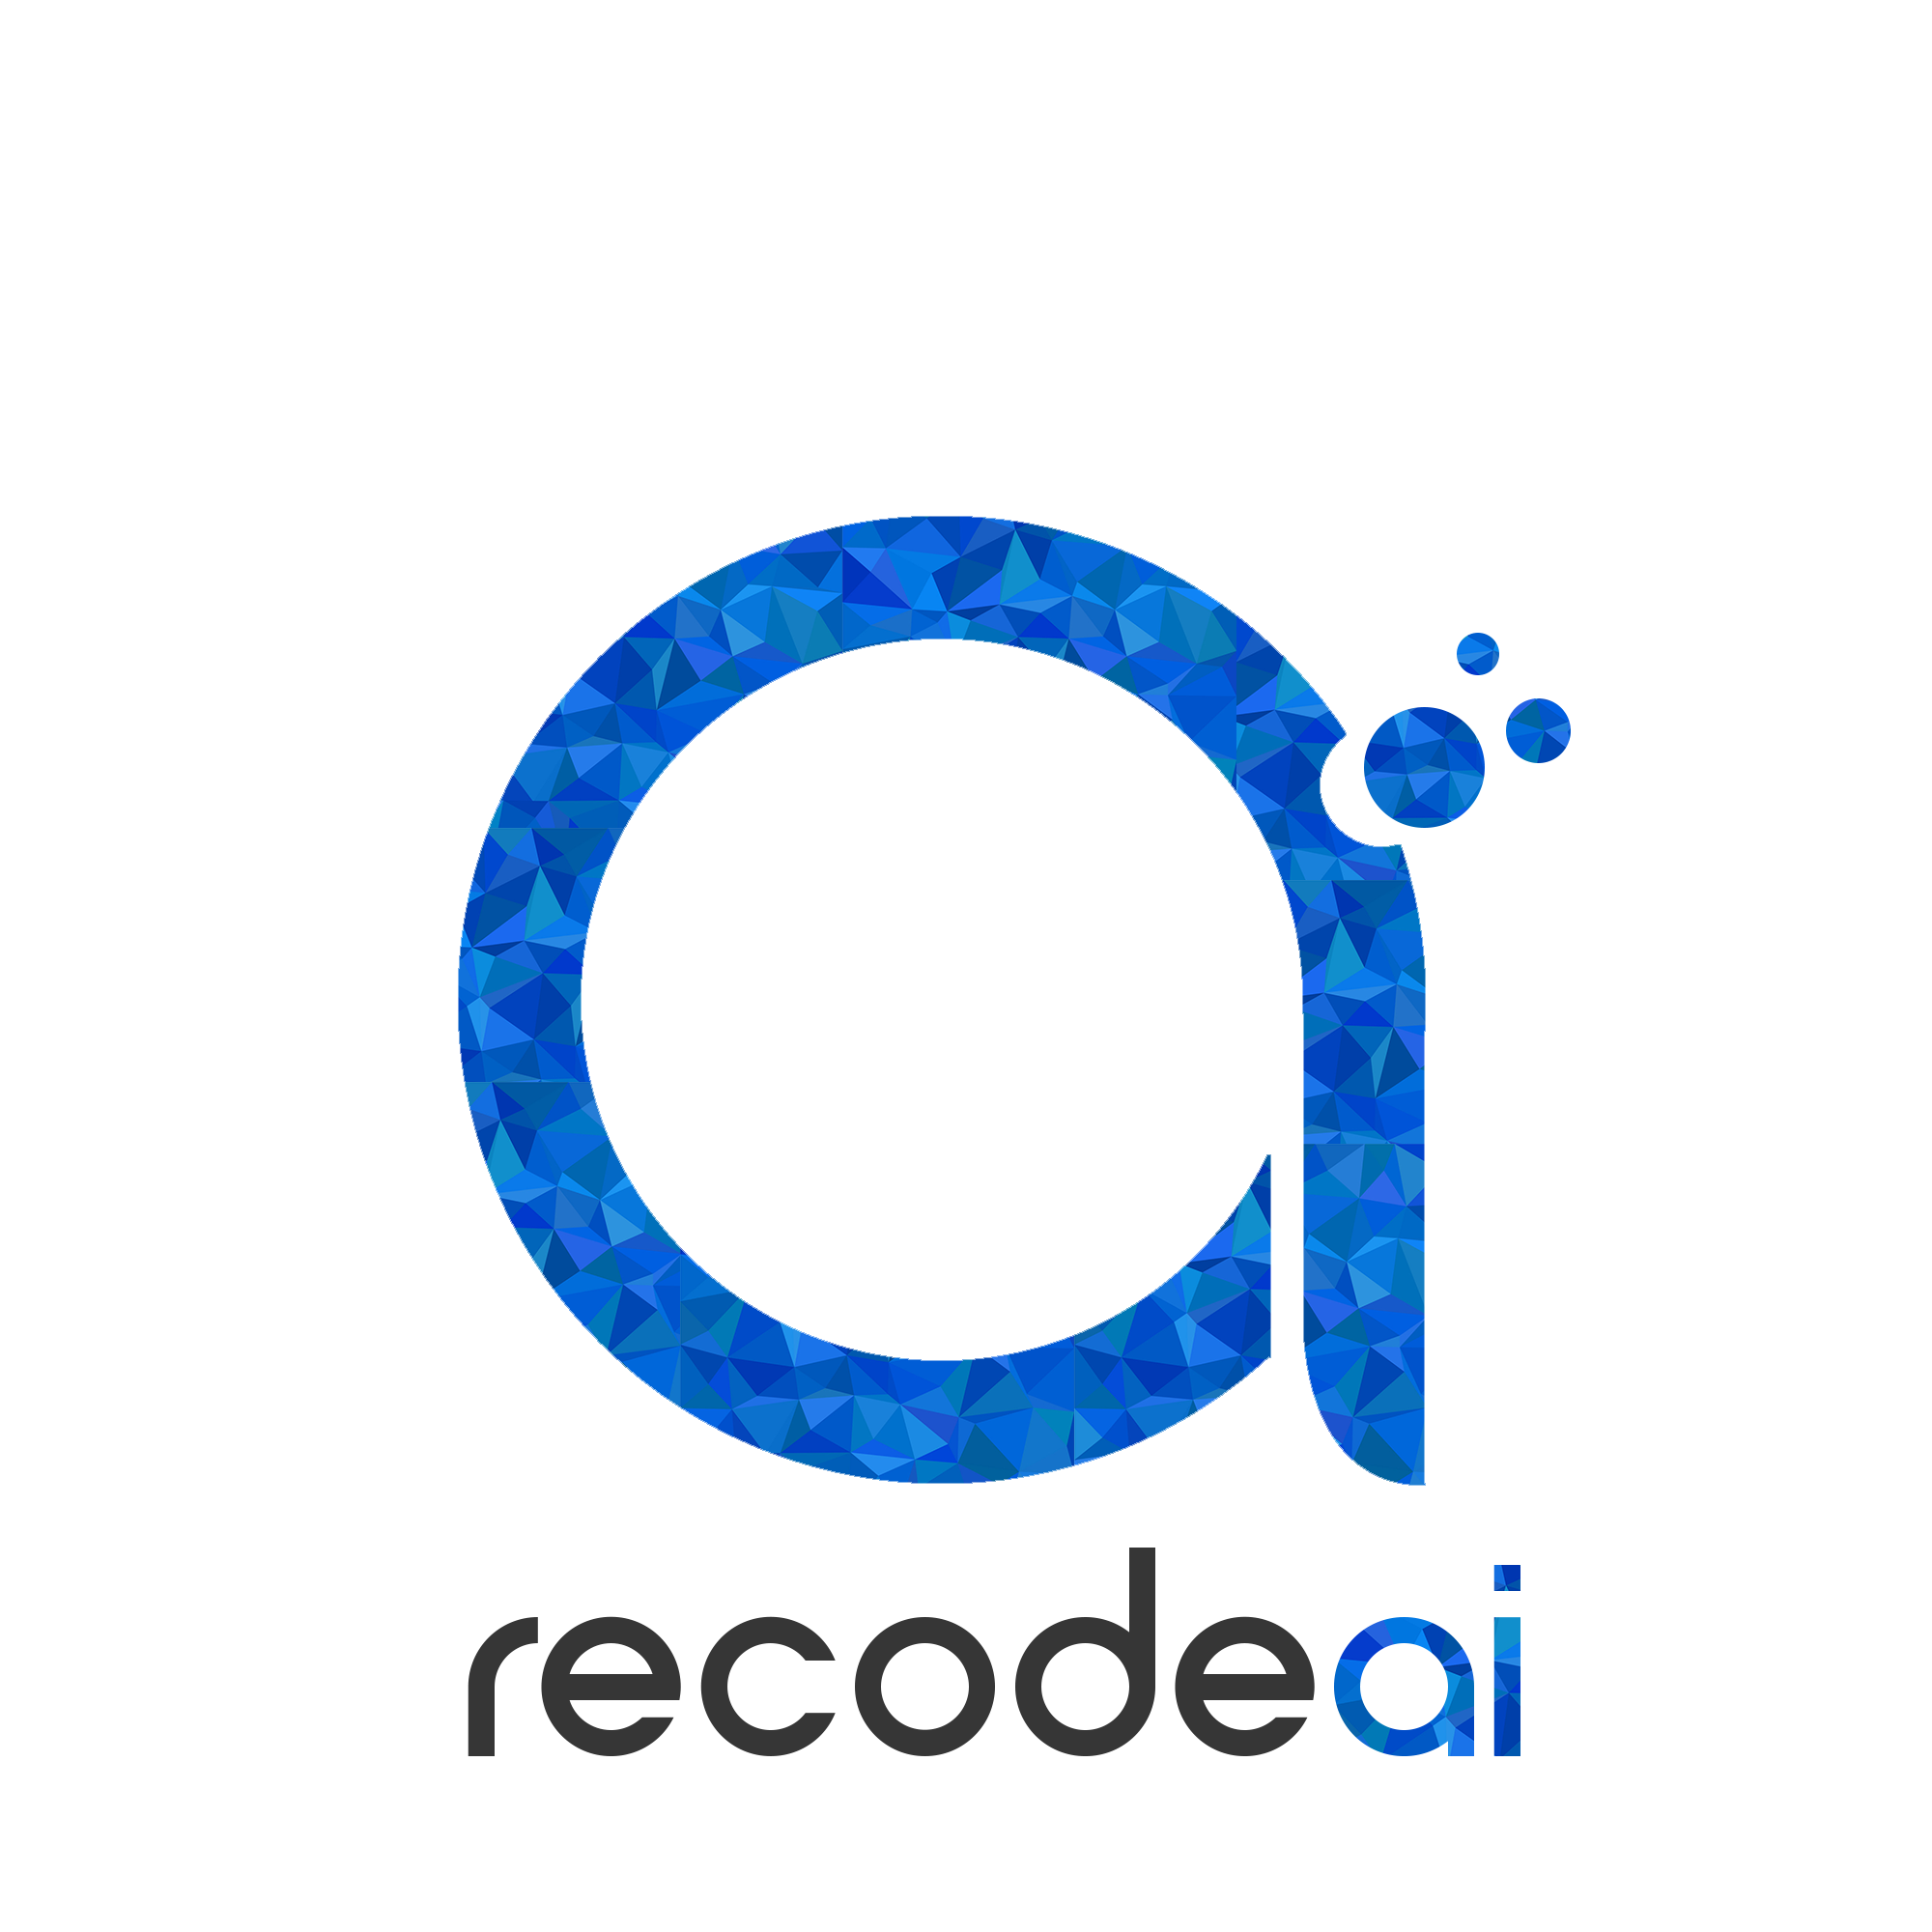 Recode AI Solutions Pvt Ltd, a chatbot developer